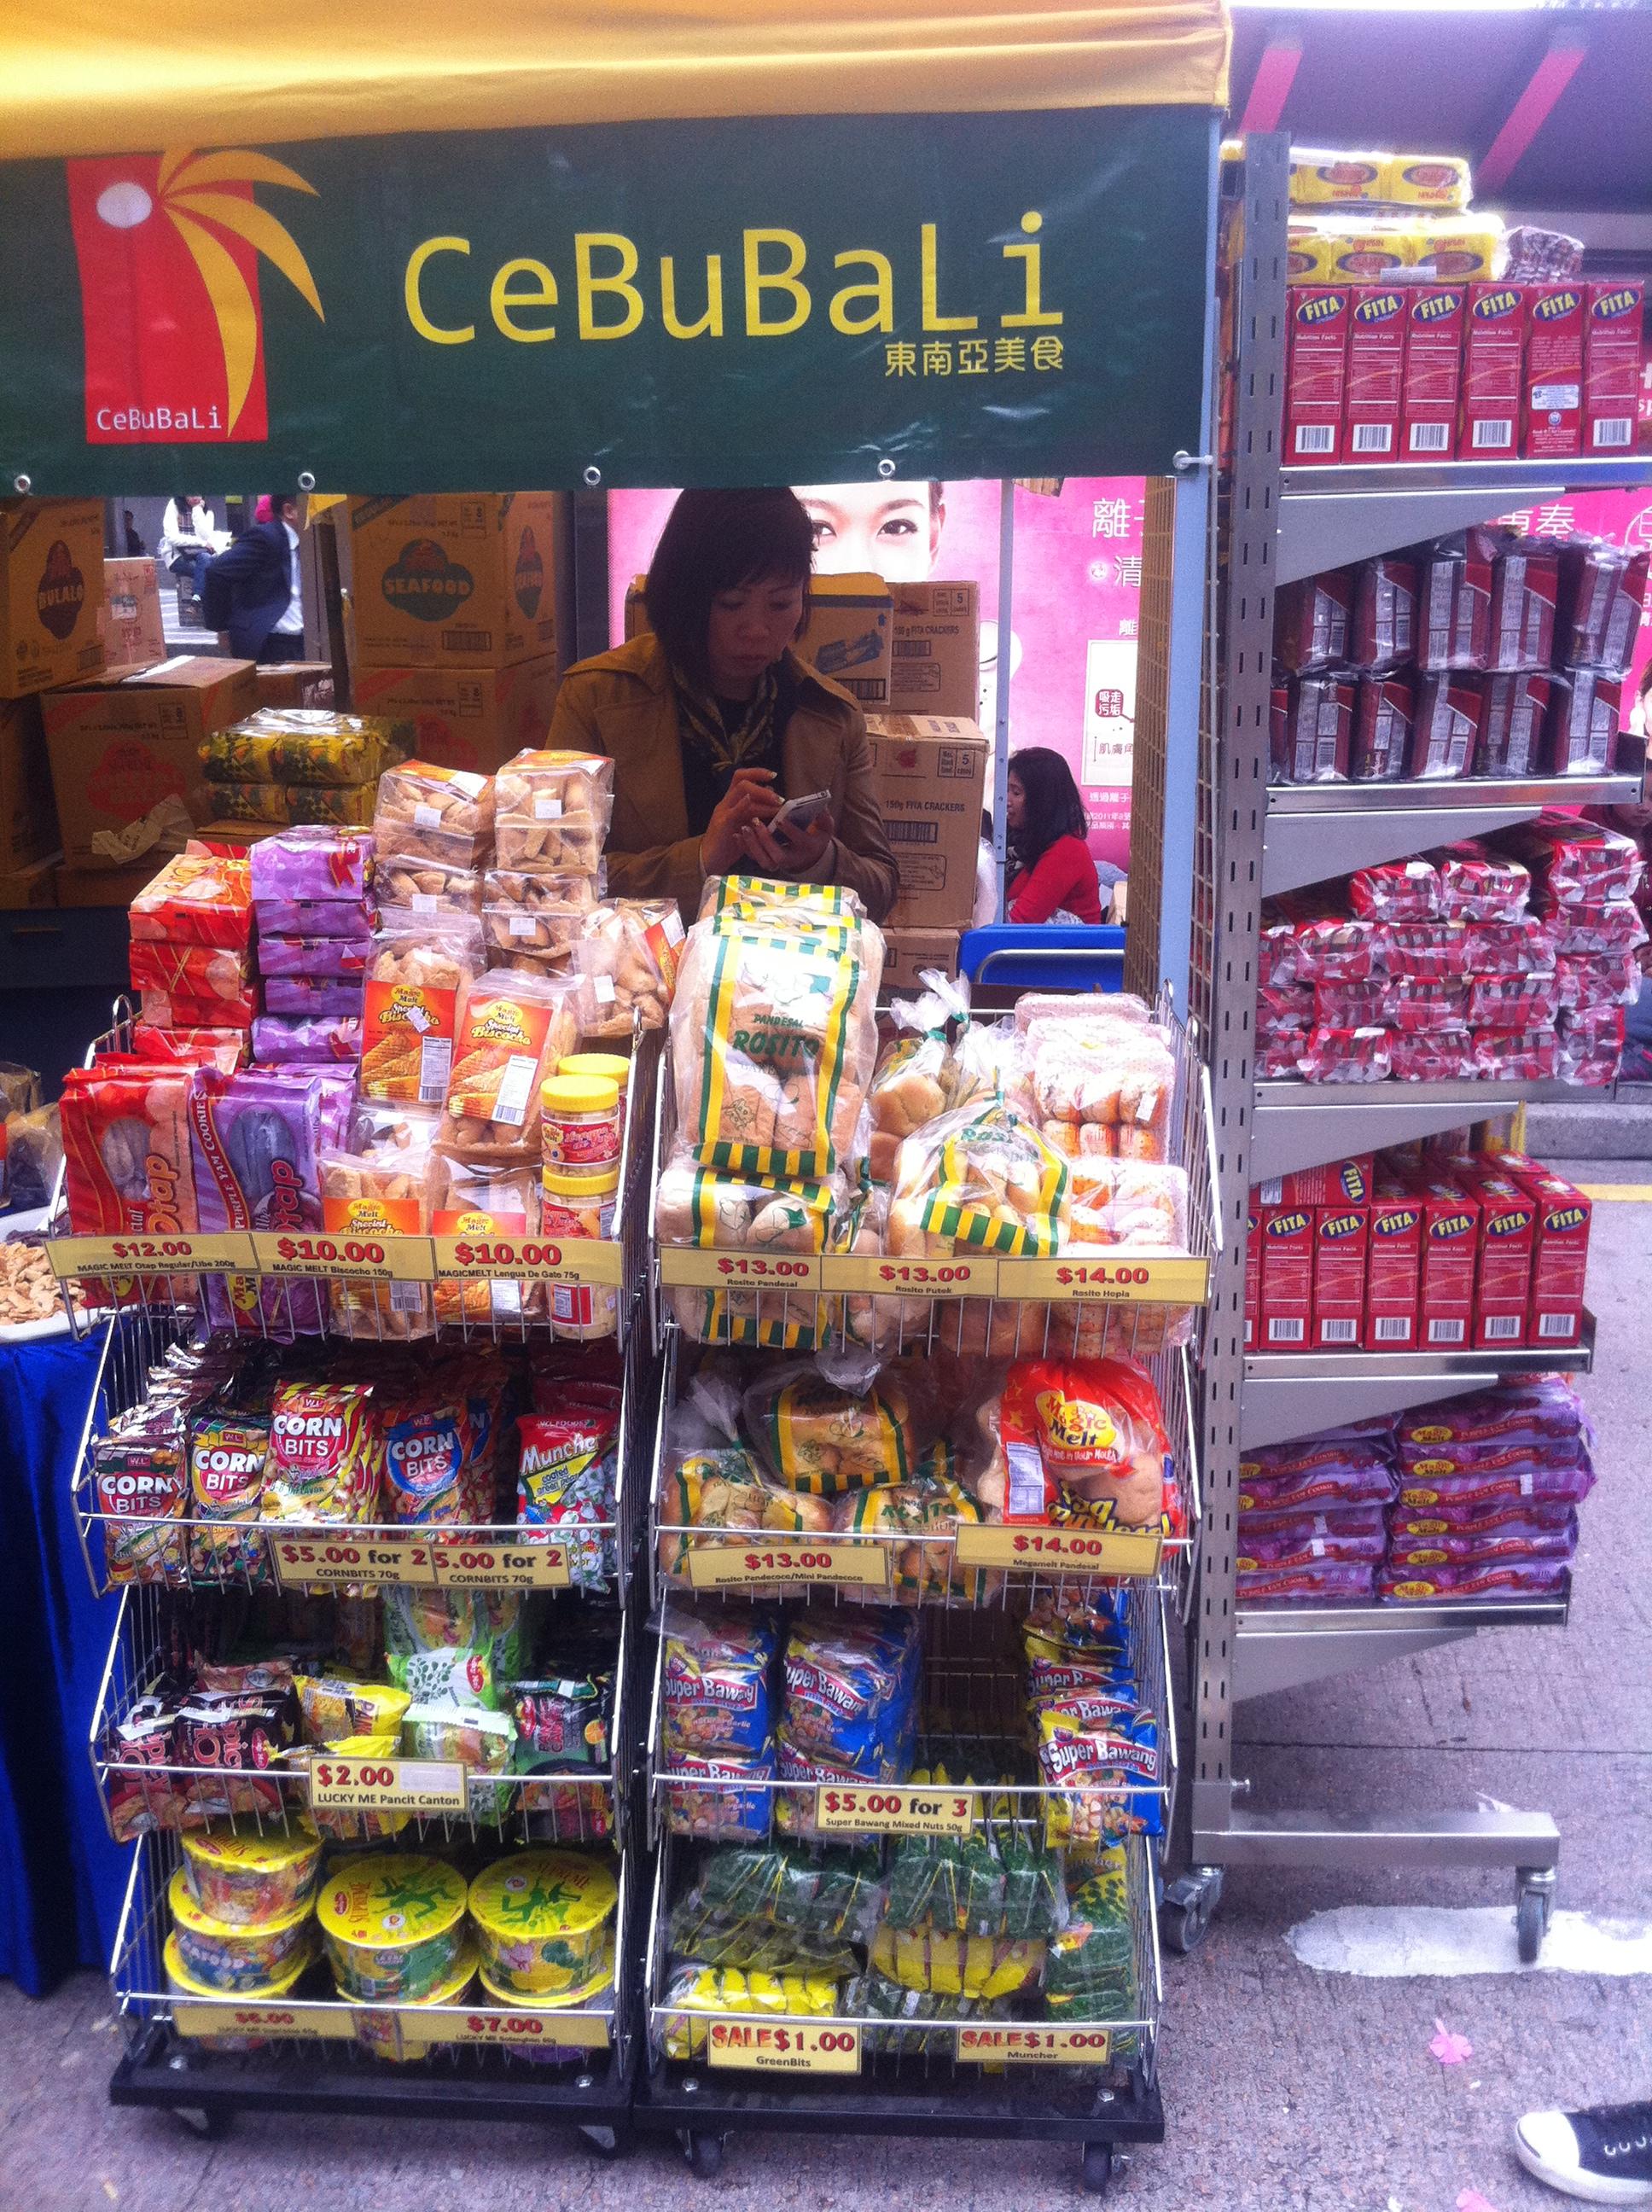 HK 中環 Central 遮打道 Chater Road Sunday 菲律賓 Food products of Philippine Jan-2012 Ip4.jpg 中文(香港): HK zh:中環 Central zh:遮打道 Chater Road Sunday zh:菲律賓人 Filipino